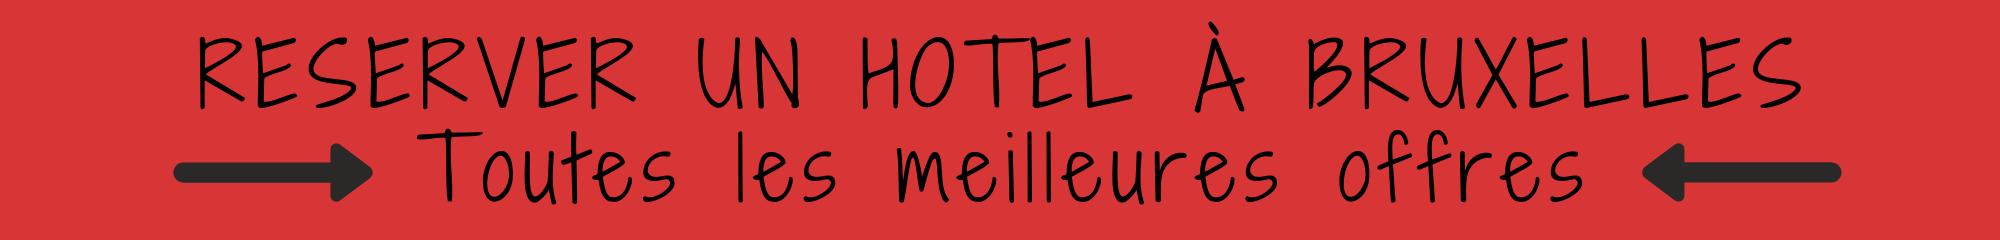 reserver-hotel-bruxelles